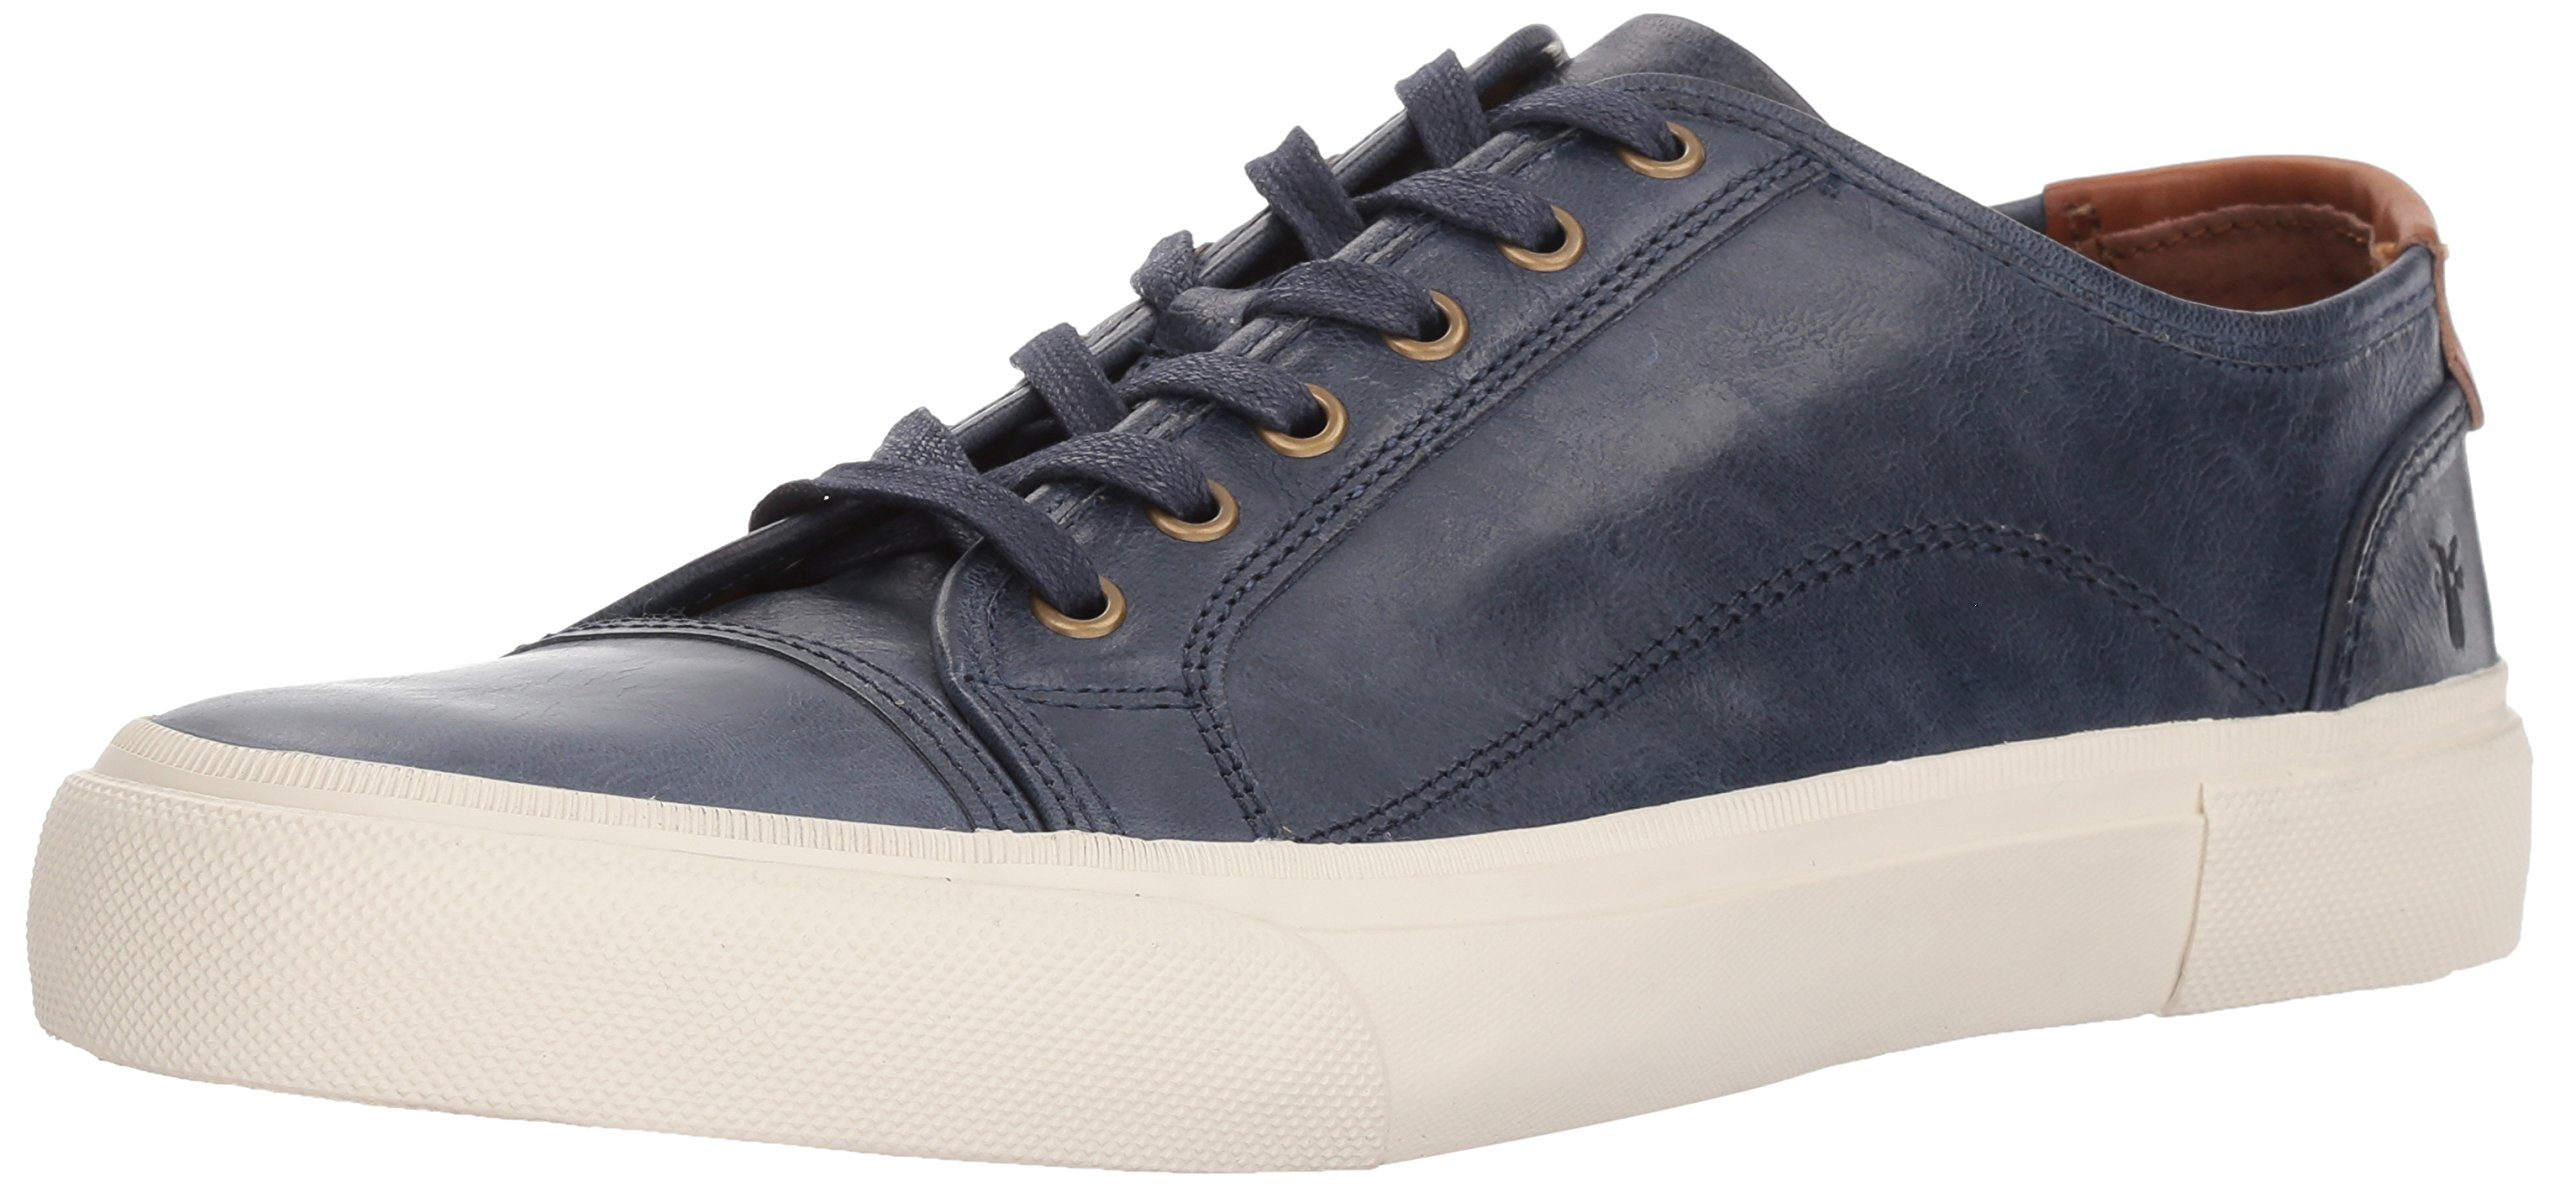 FRYE Men's Ludlow Cap Lowlace Sneaker, Navy, 11 Medium US by FRYE (Image #1)